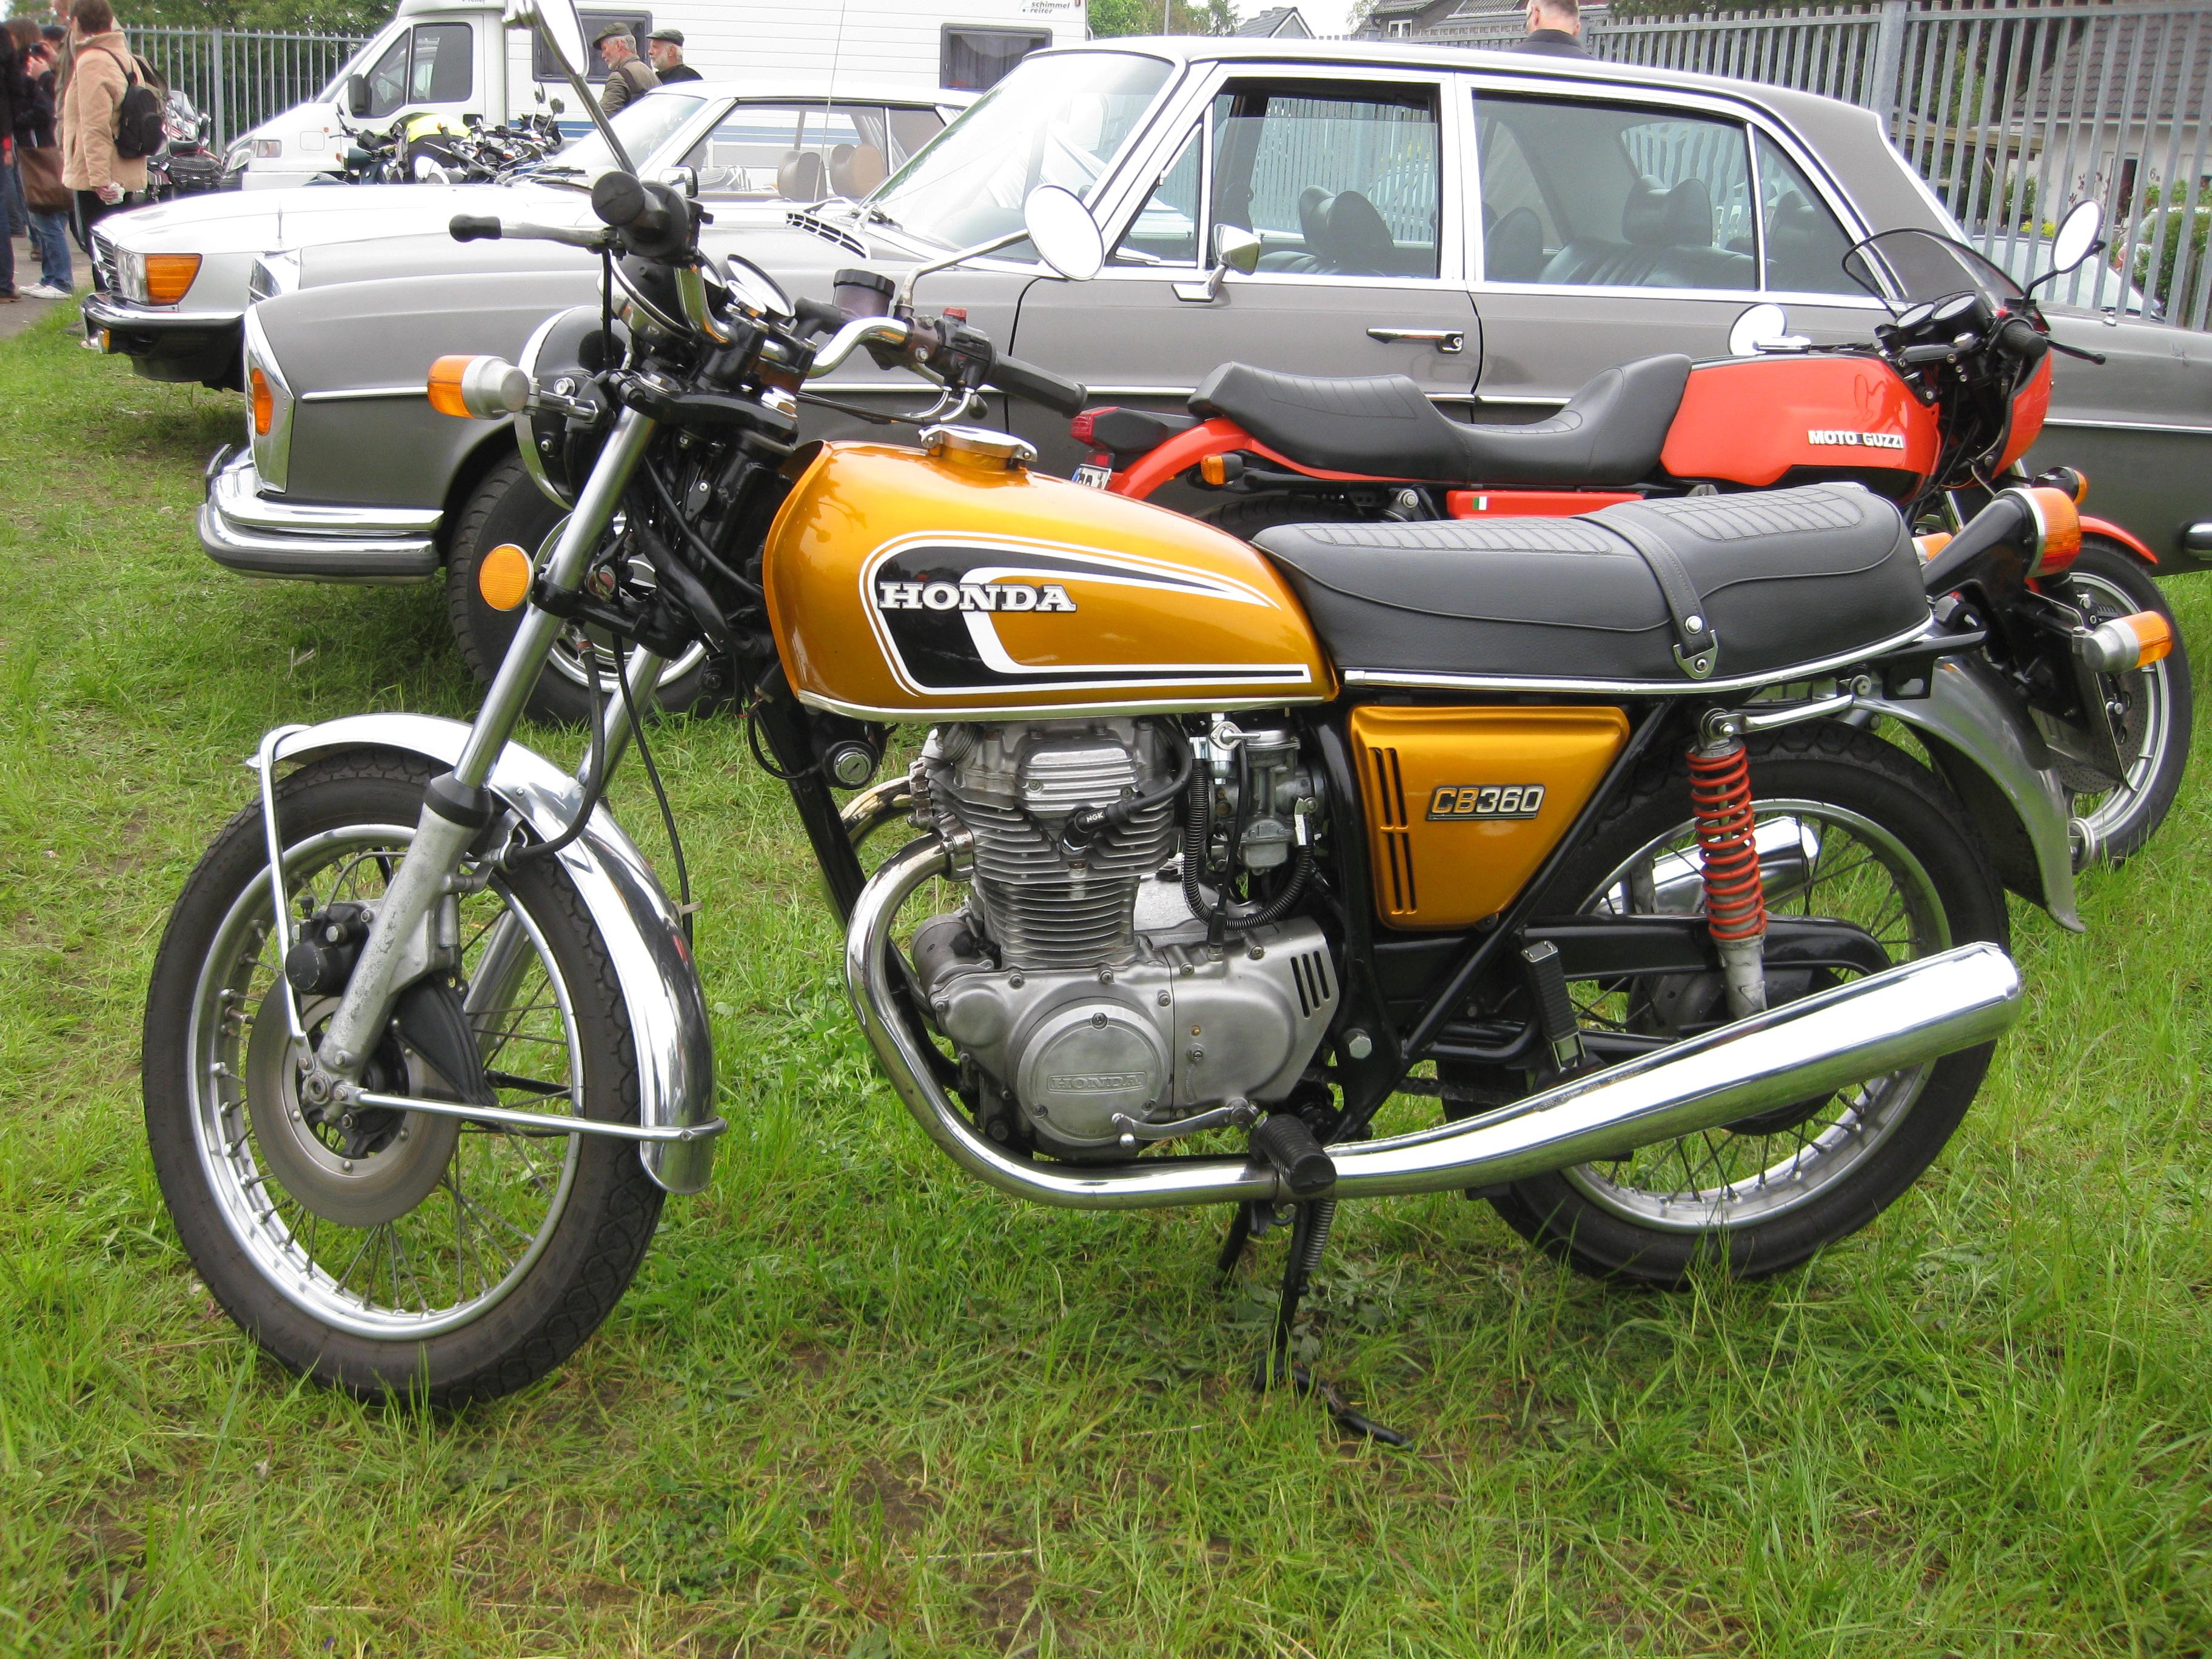 File:Honda CB360.JPG - Wikimedia Commons